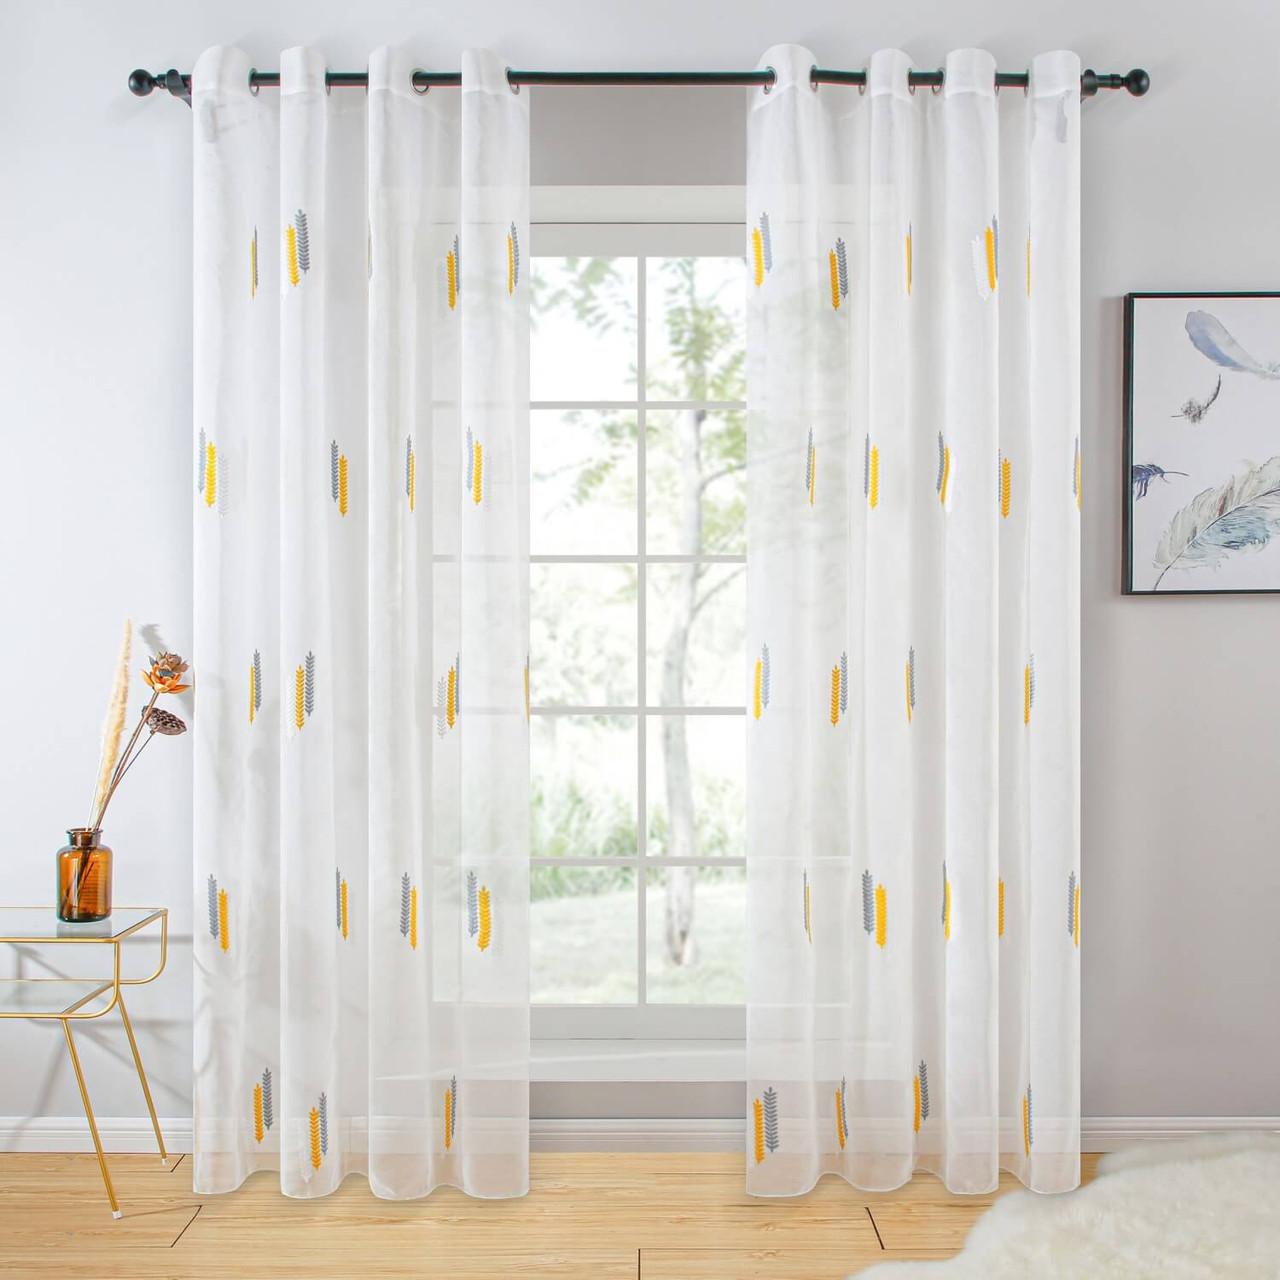 Sheer Curtain Panel Grommet-Top Window Treatments DMC723 Dolce Mela 8171460151532